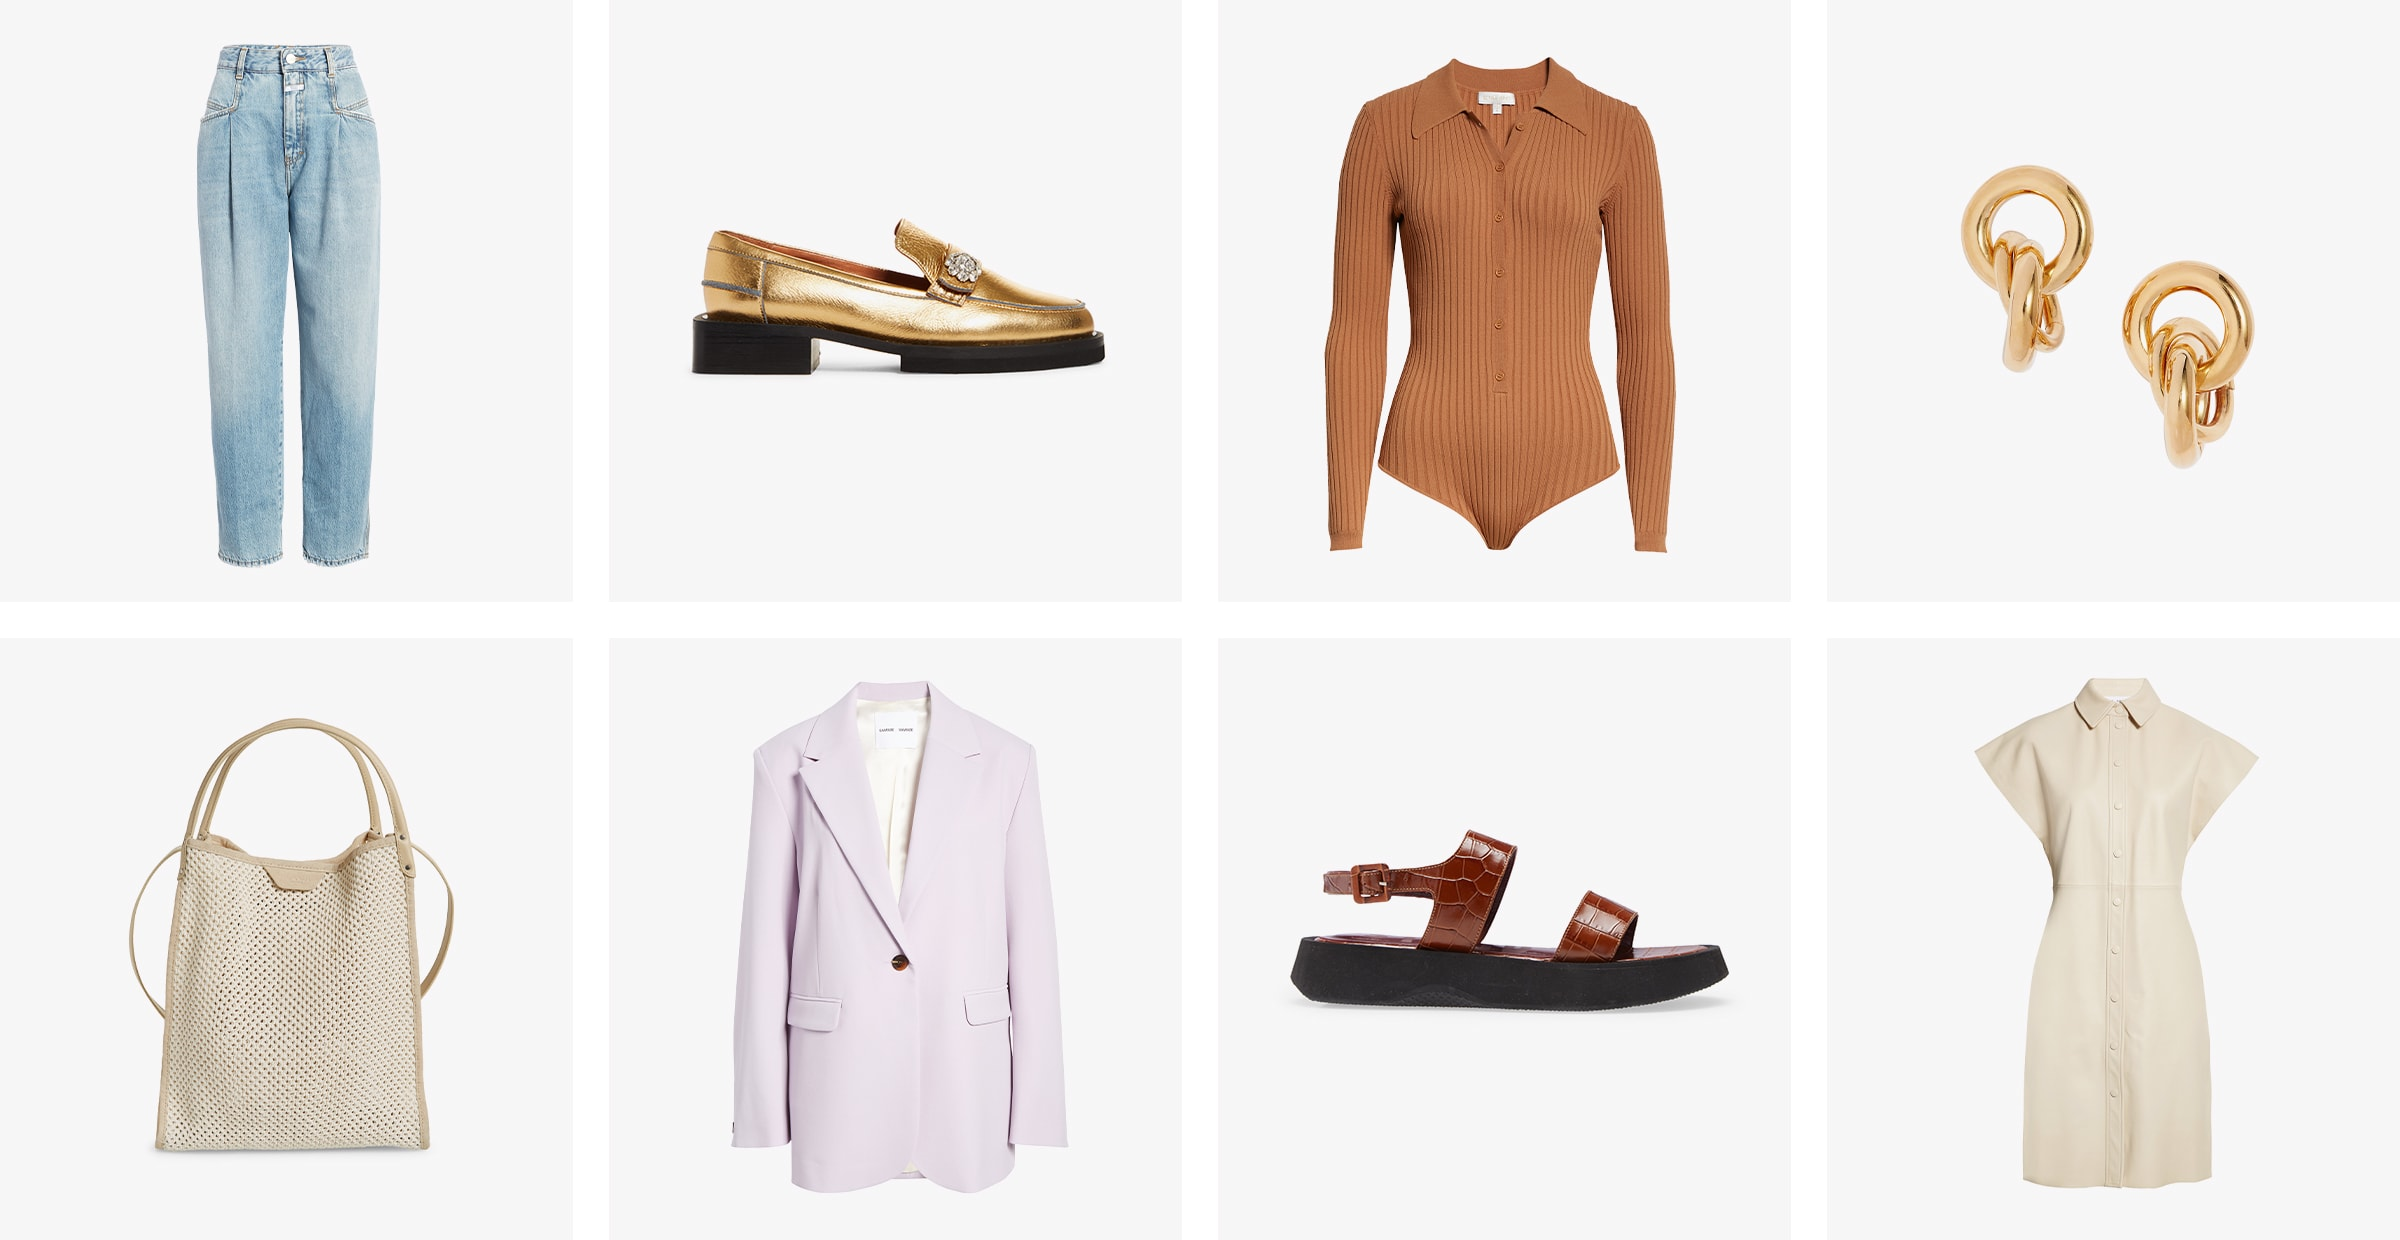 Women's jeans, gold loafers, orange bodysuit, earrings, white handbag, purple blazer, brown sandals and white dress.